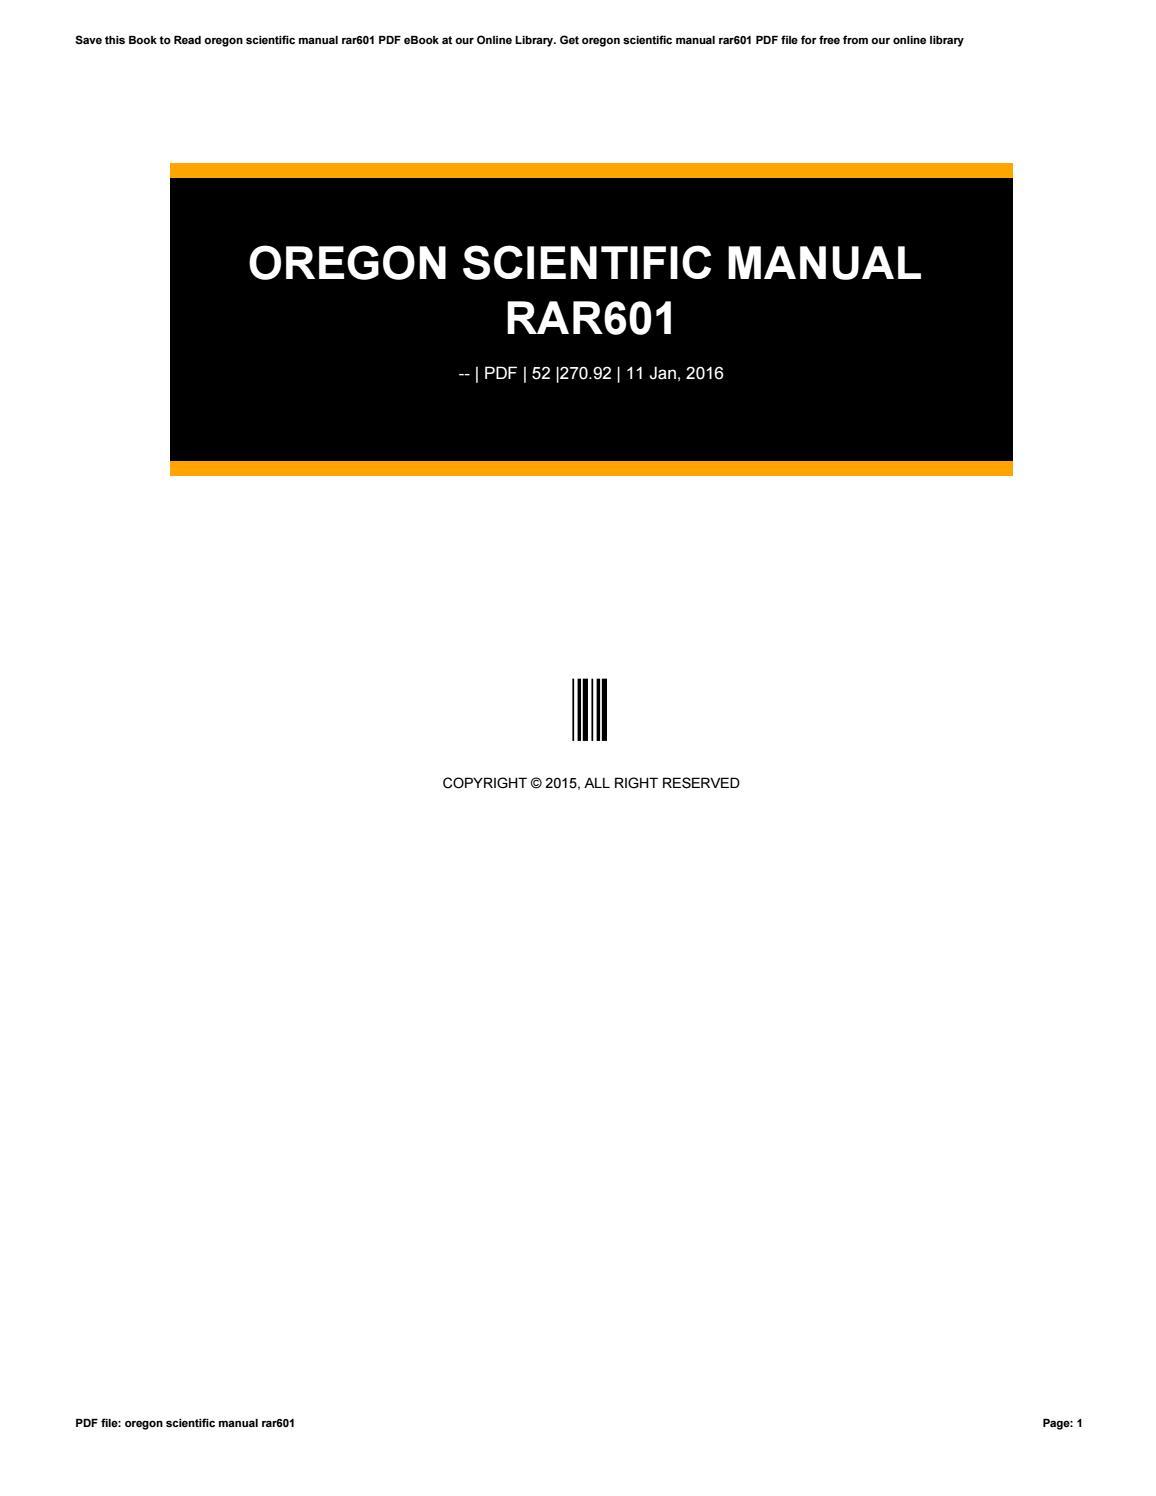 oregon scientific manual rar601 by uacro3 issuu rh issuu com Oregon Scientific At18 08 Manual Oregon Scientific Atomic Clock Manual